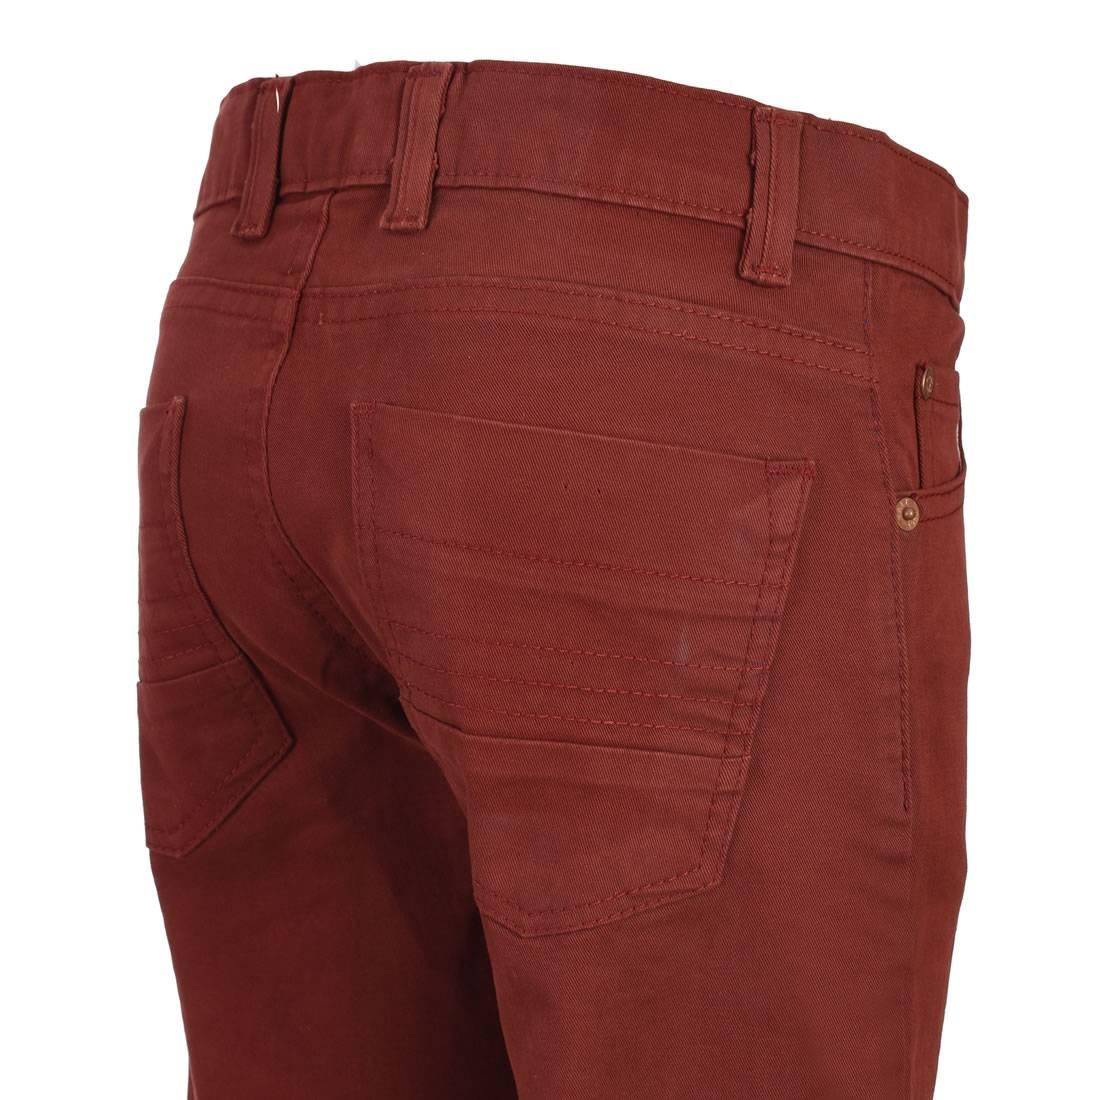 021109065473-04-Pantalon-Vaquero-Boys-Gabardina-Con-Elastano-Skinny-Fit-Cintura-Ajustable-Vino-yale